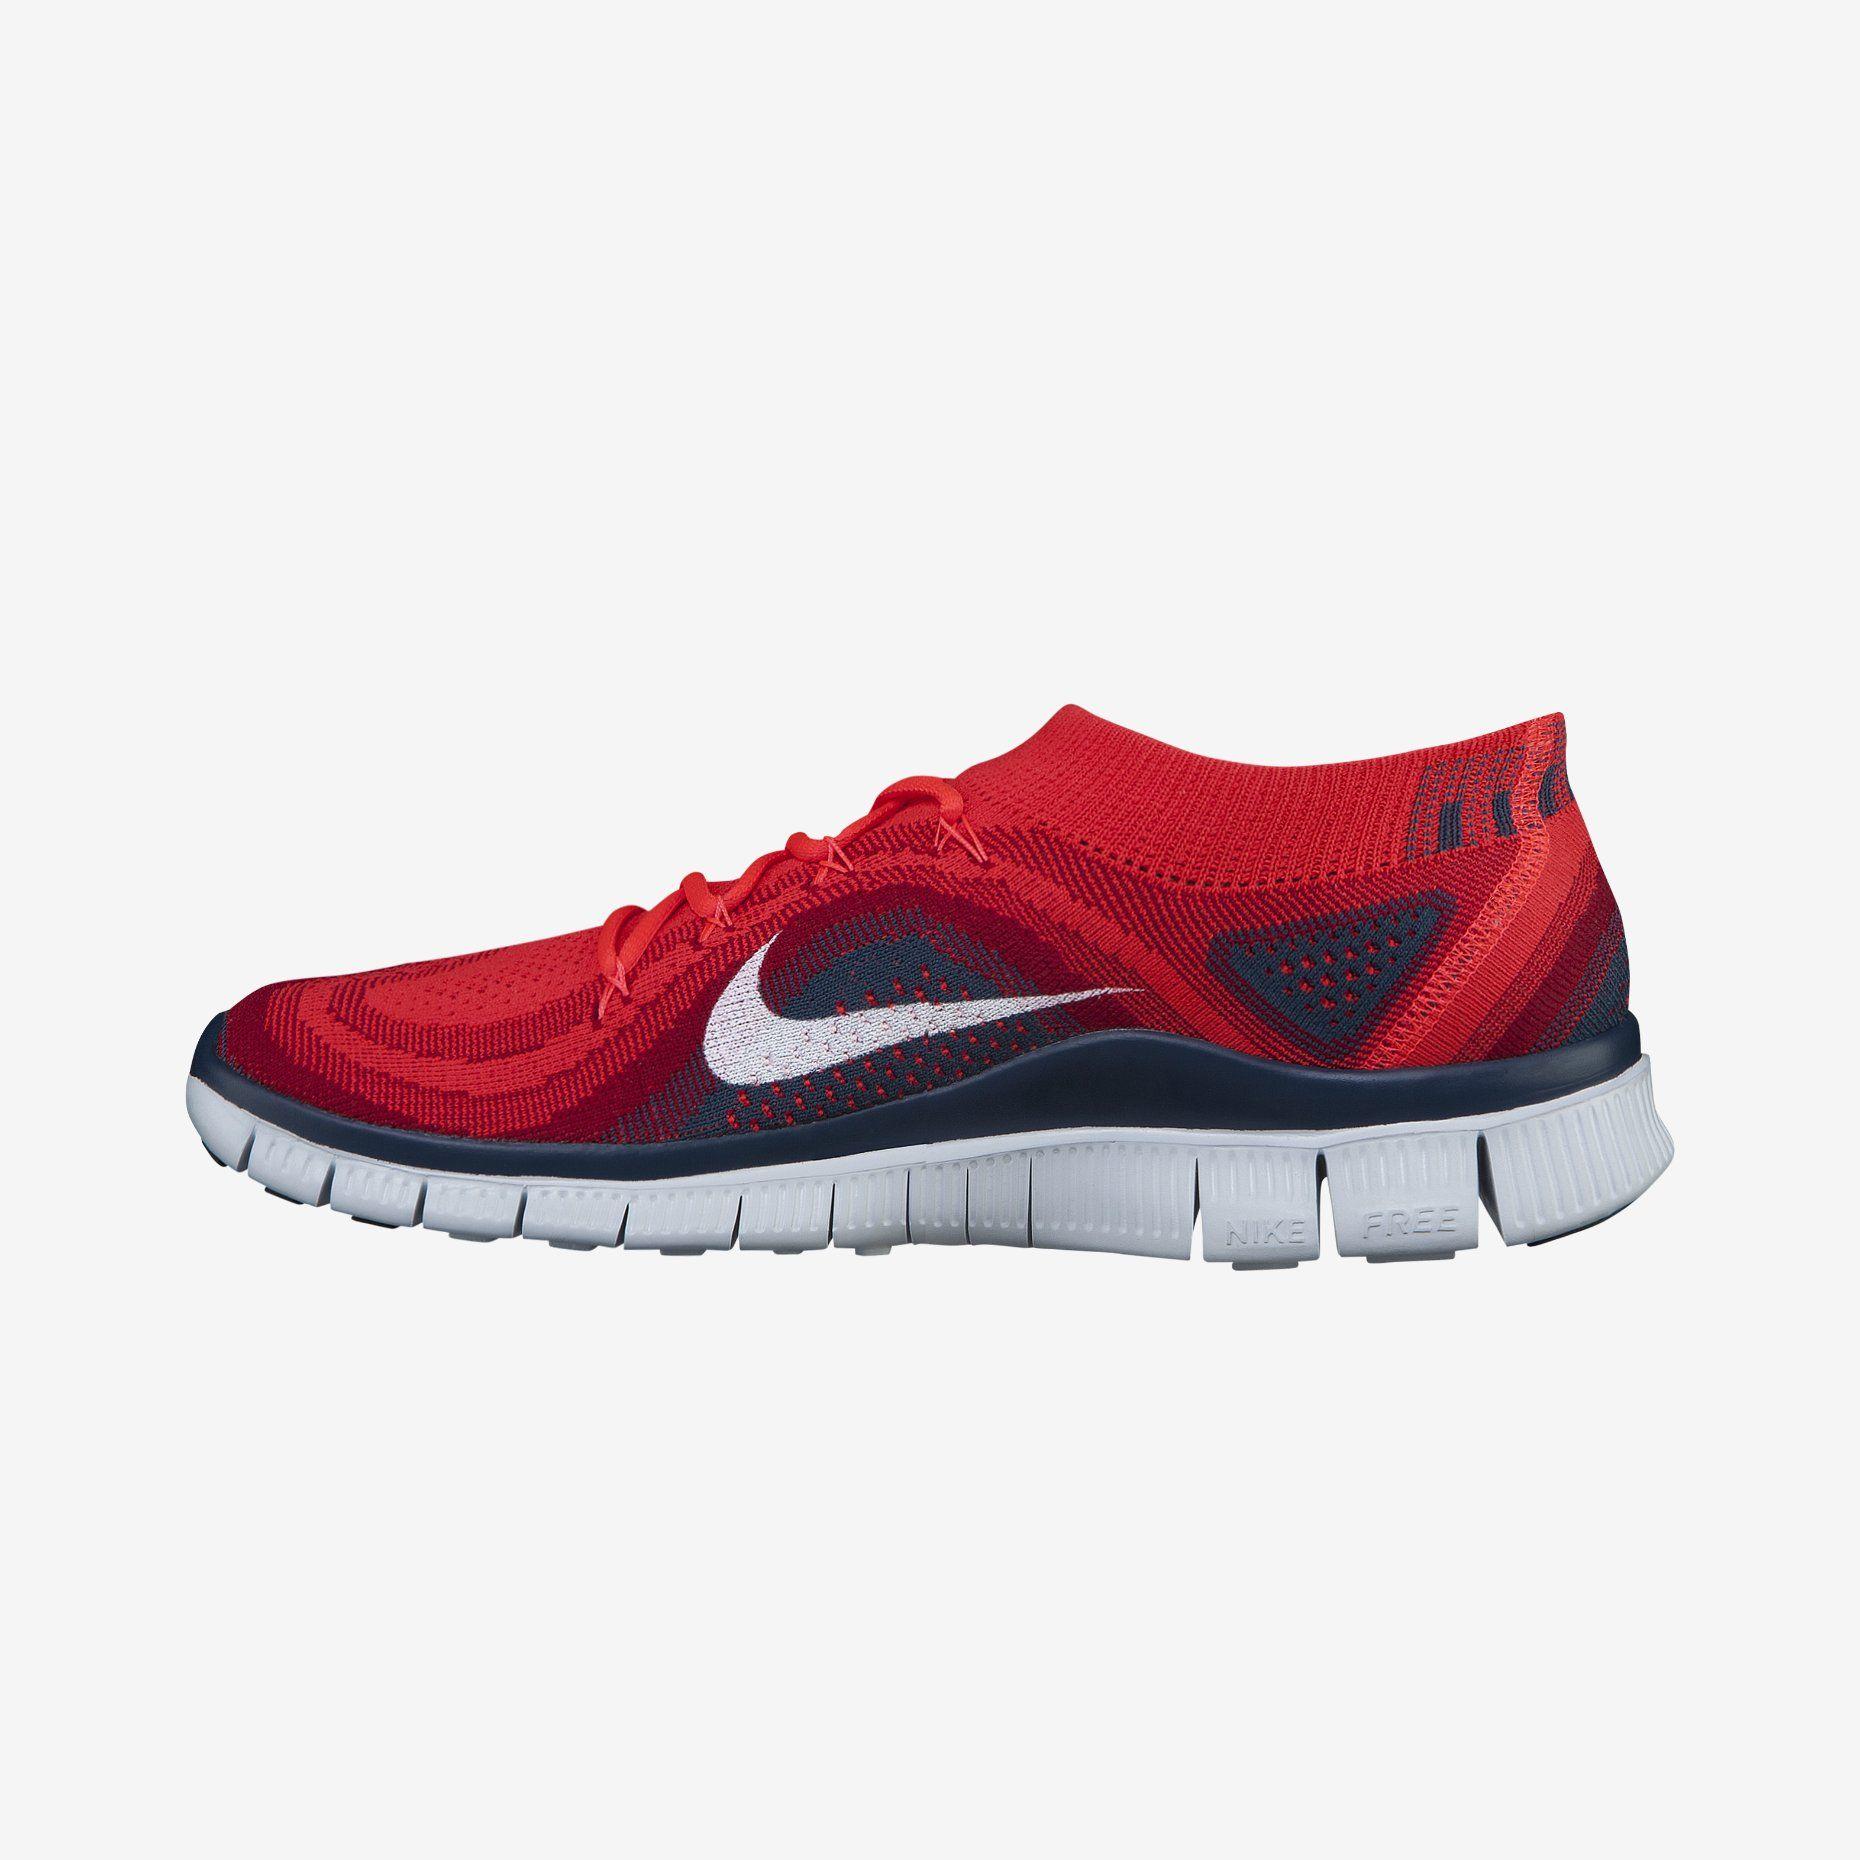 los angeles e822f b5eb5 Nike Free Flyknit+ Men s Running Shoe